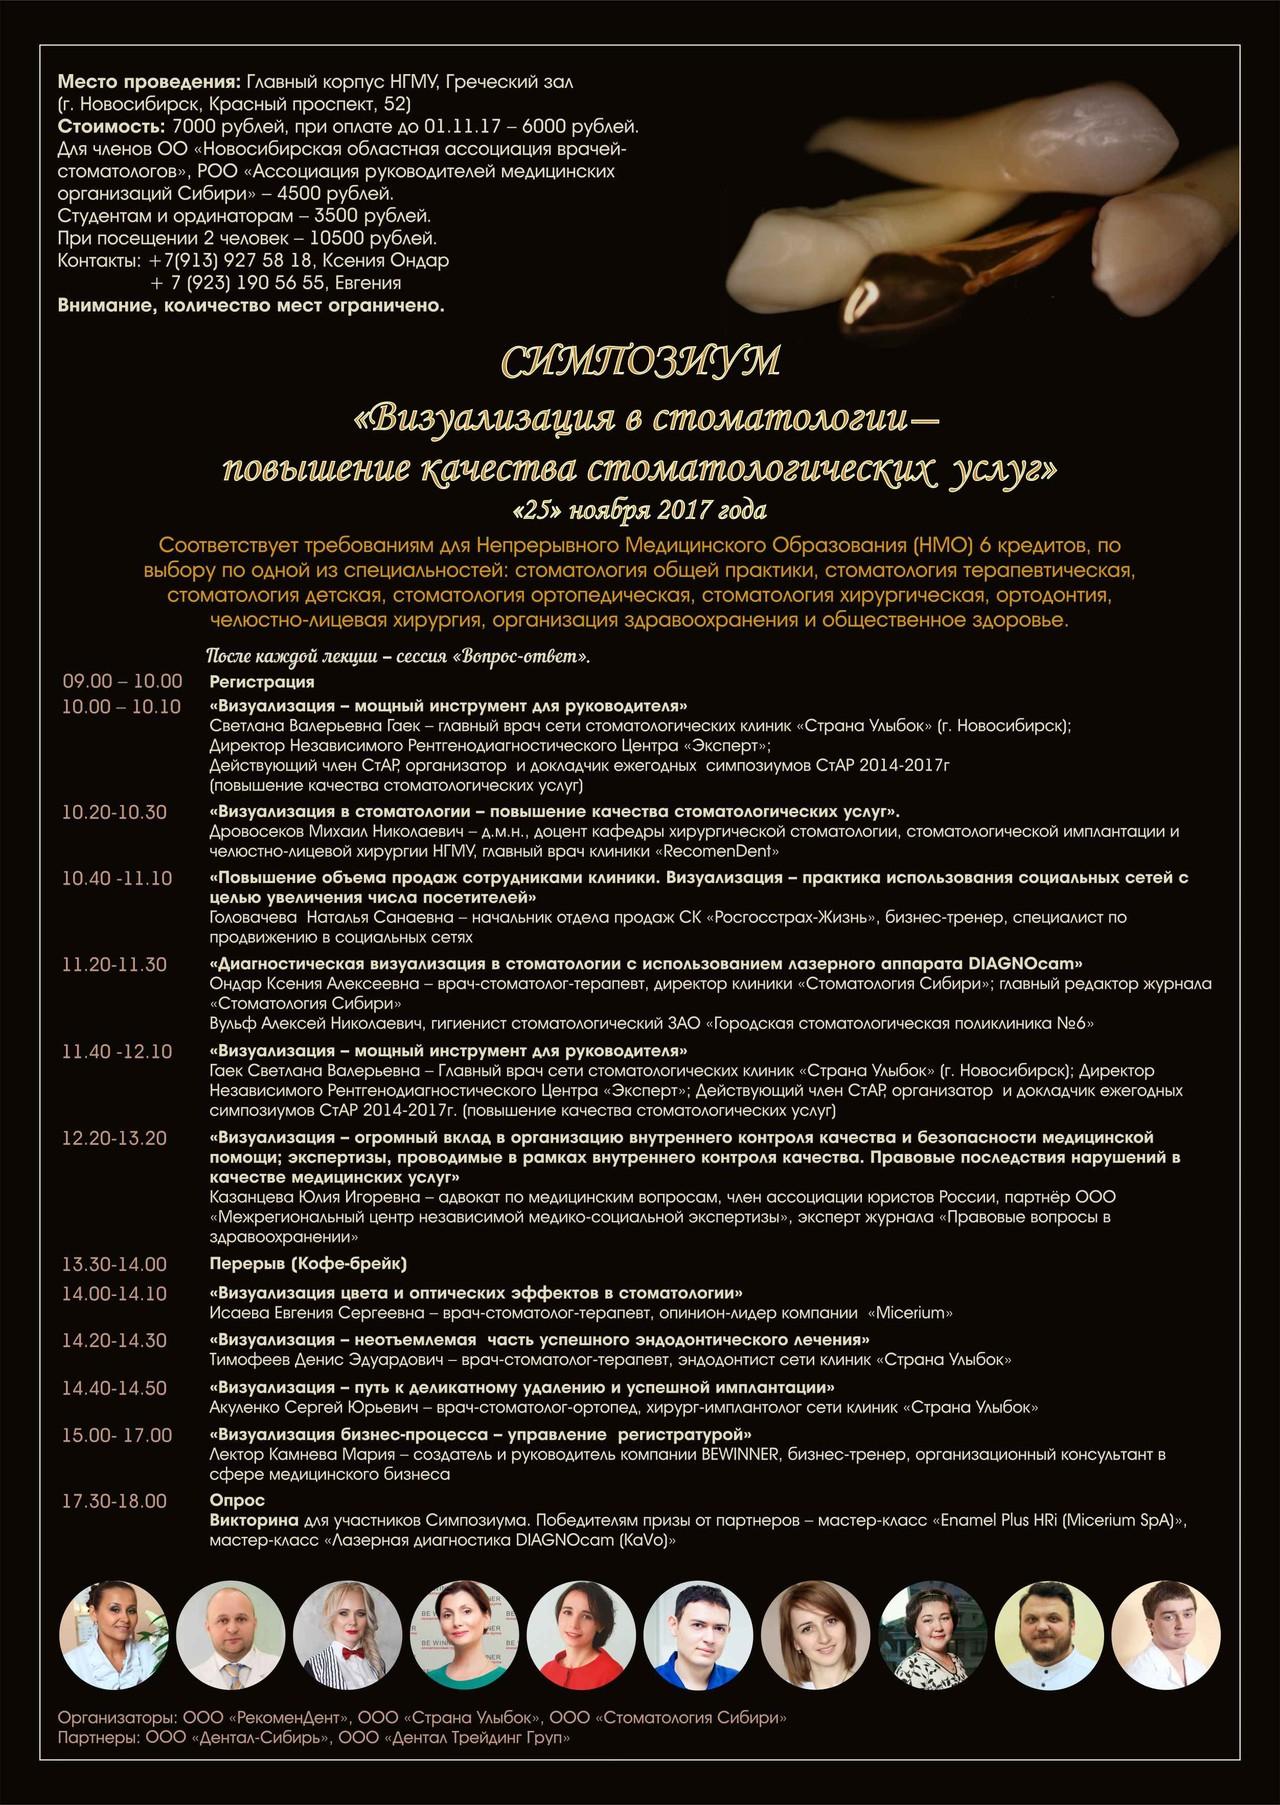 Программа симпозиума